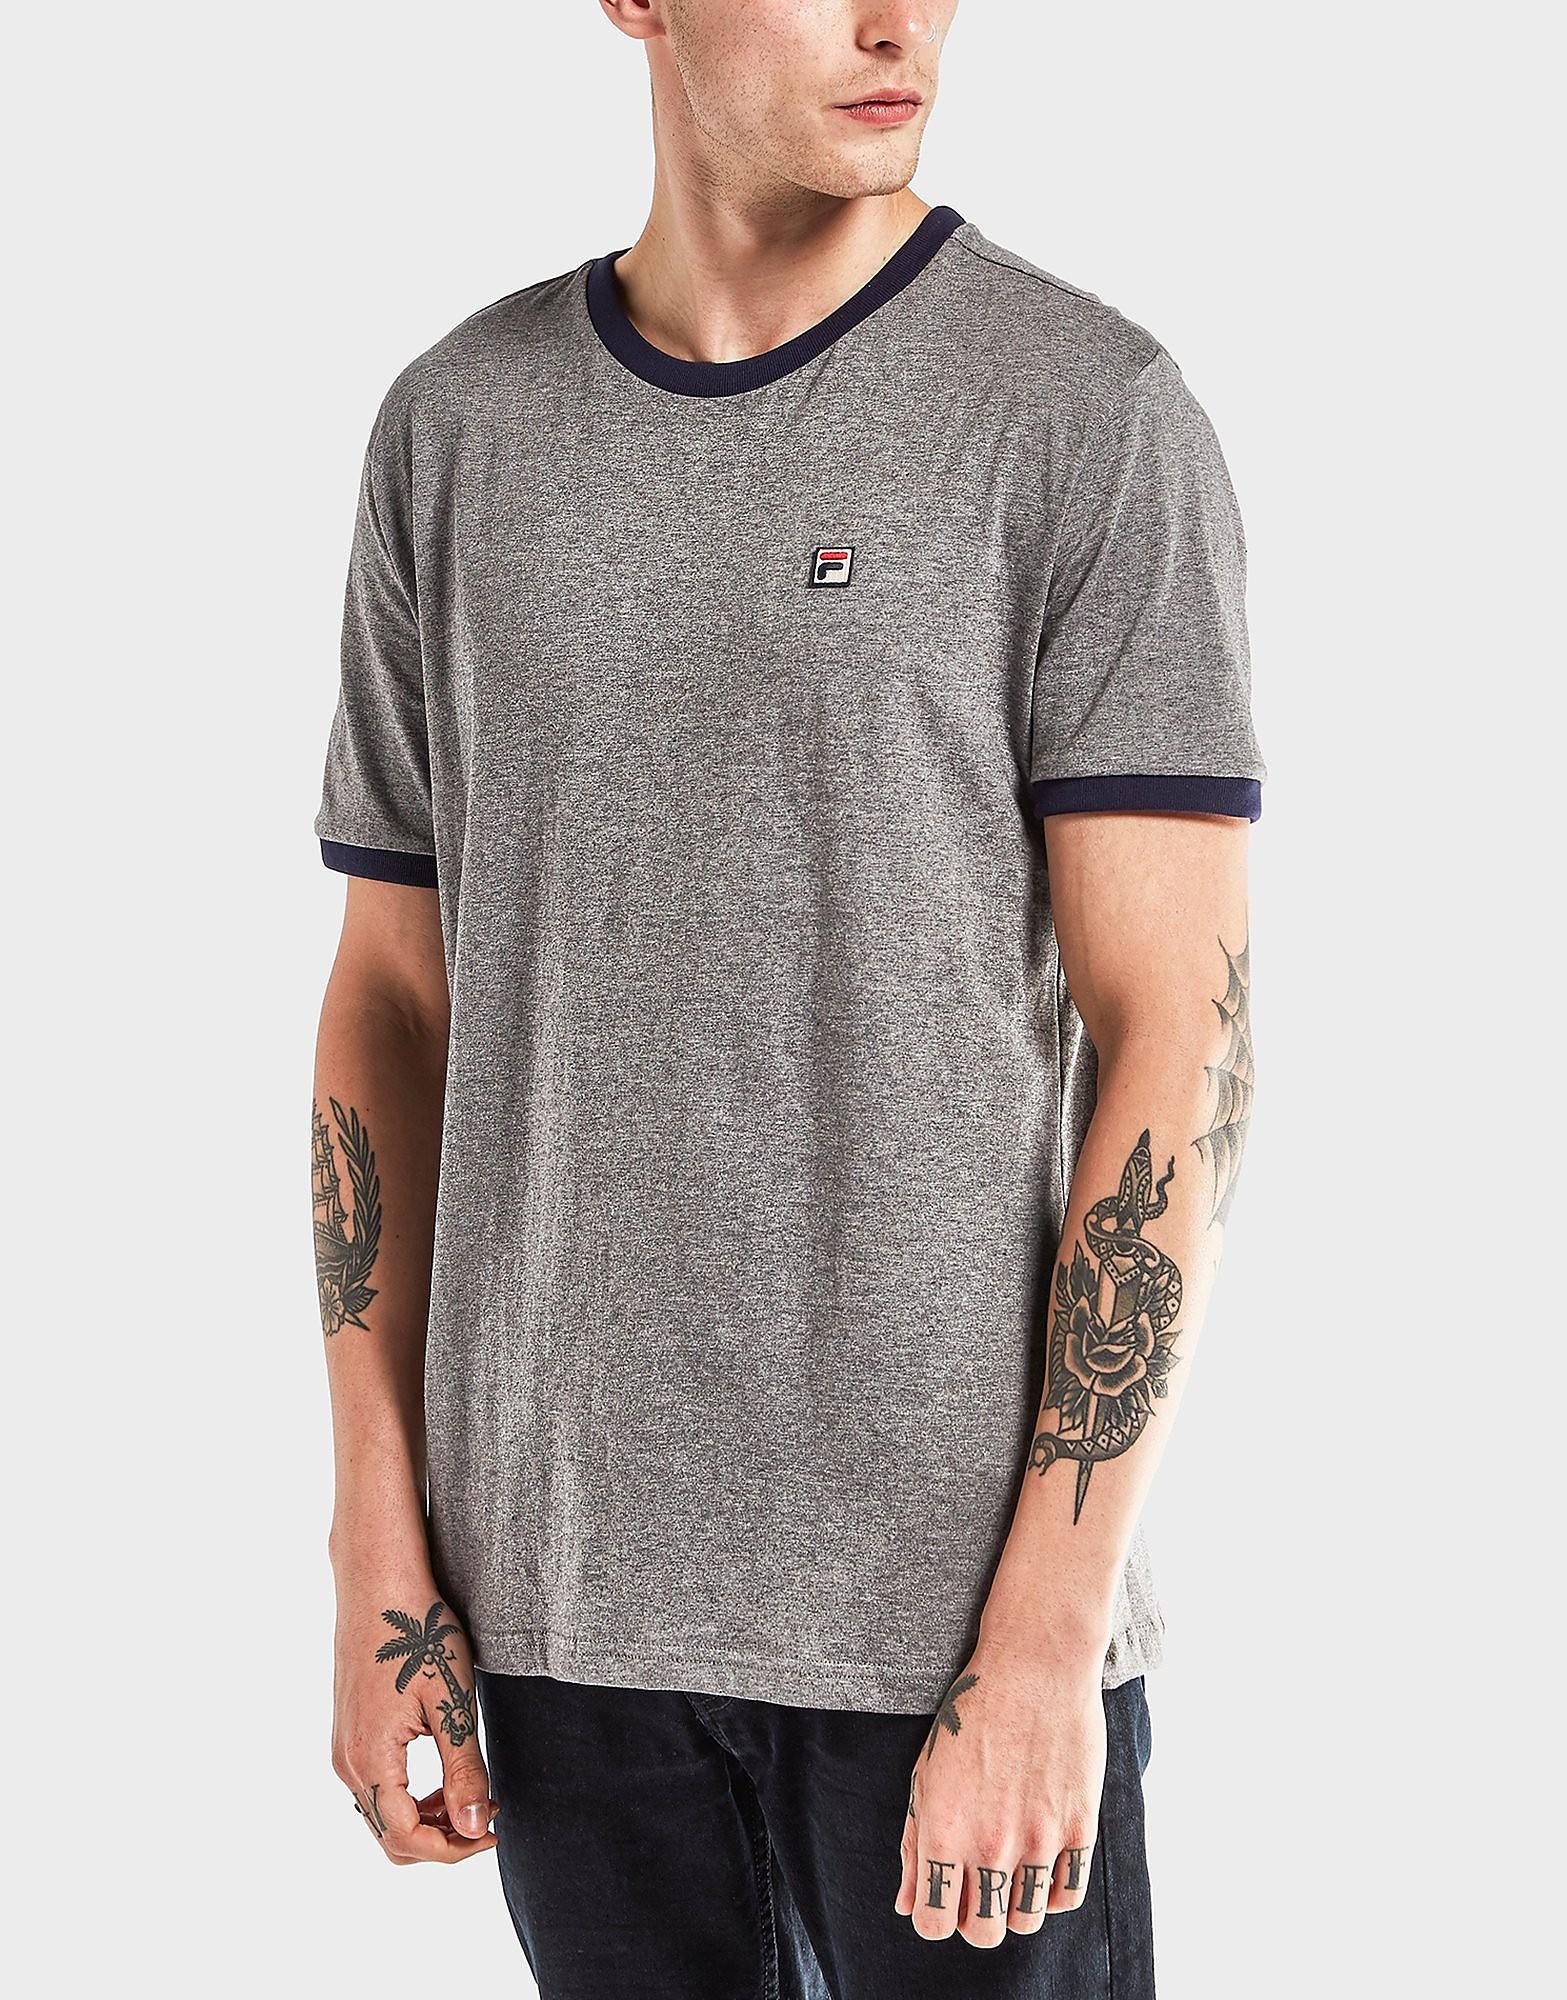 Fila Marconi Ringer Short Sleeve T-Shirt